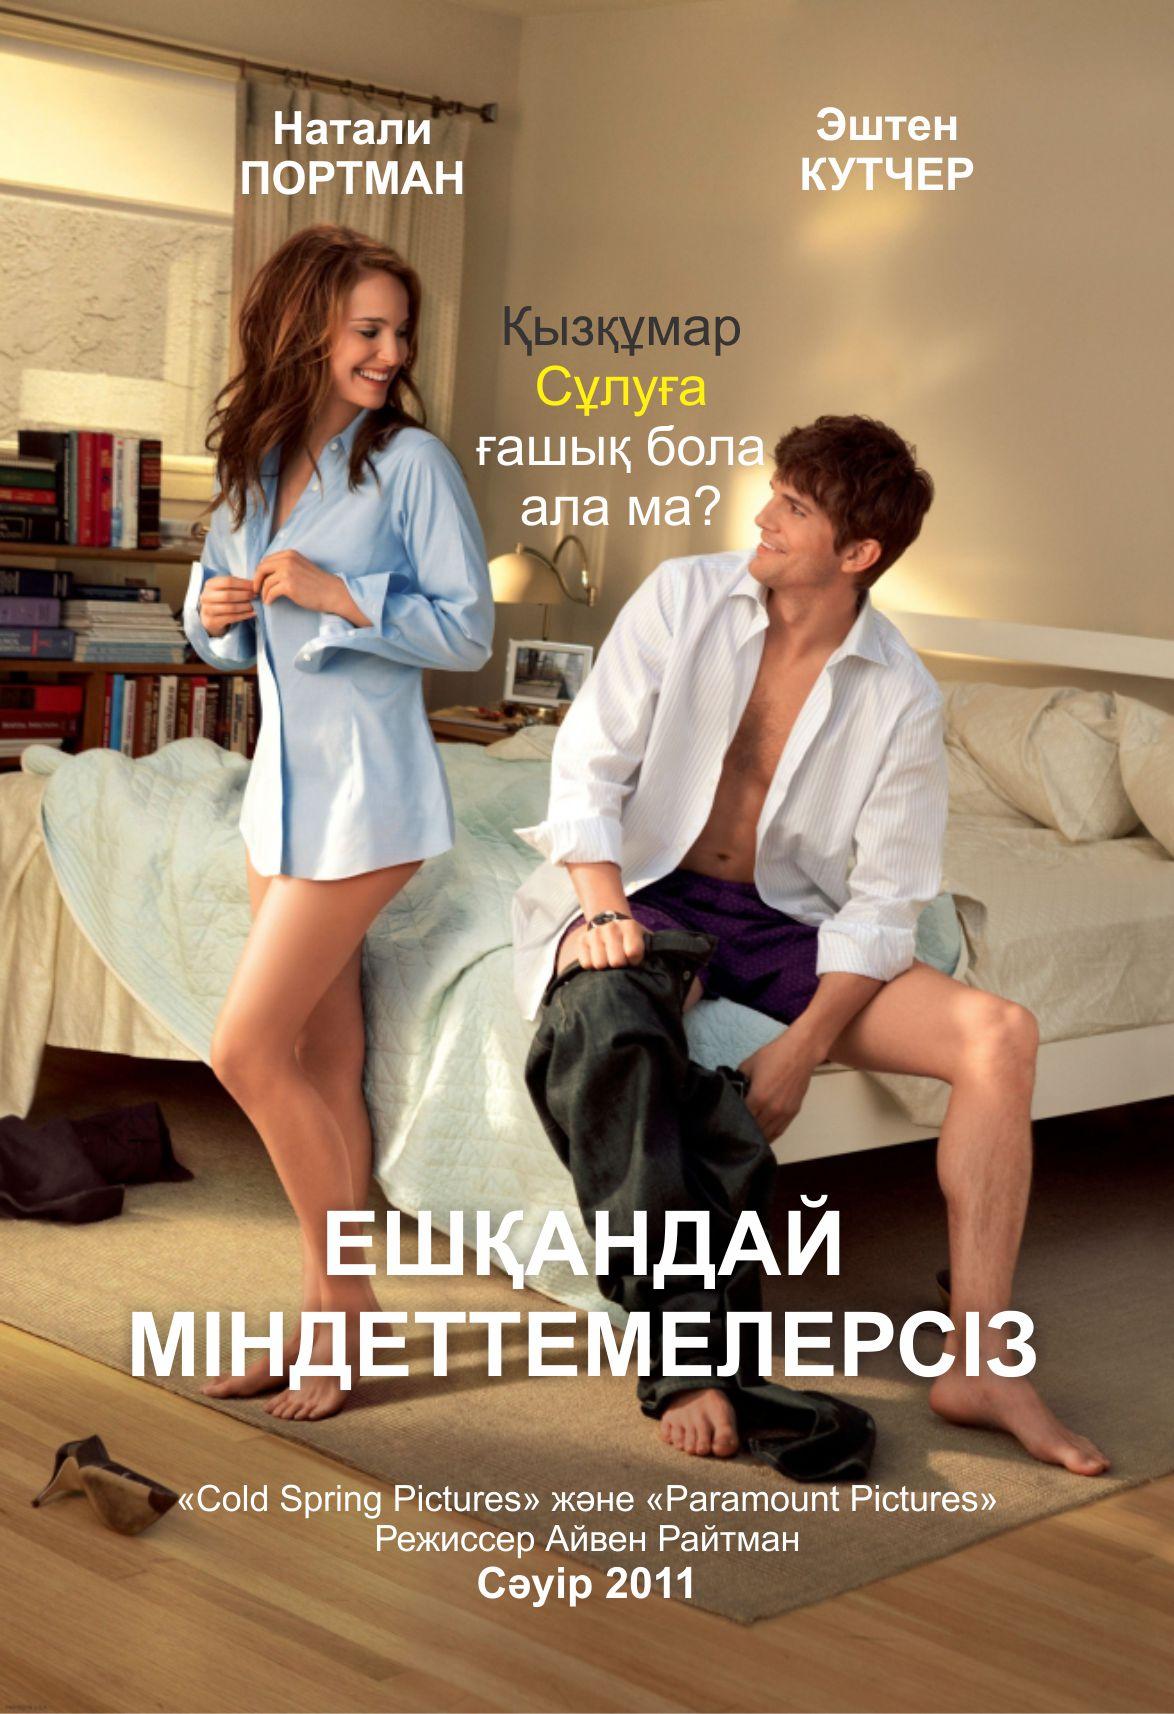 bolshe-chem-seks-s-russkimi-subtitrami